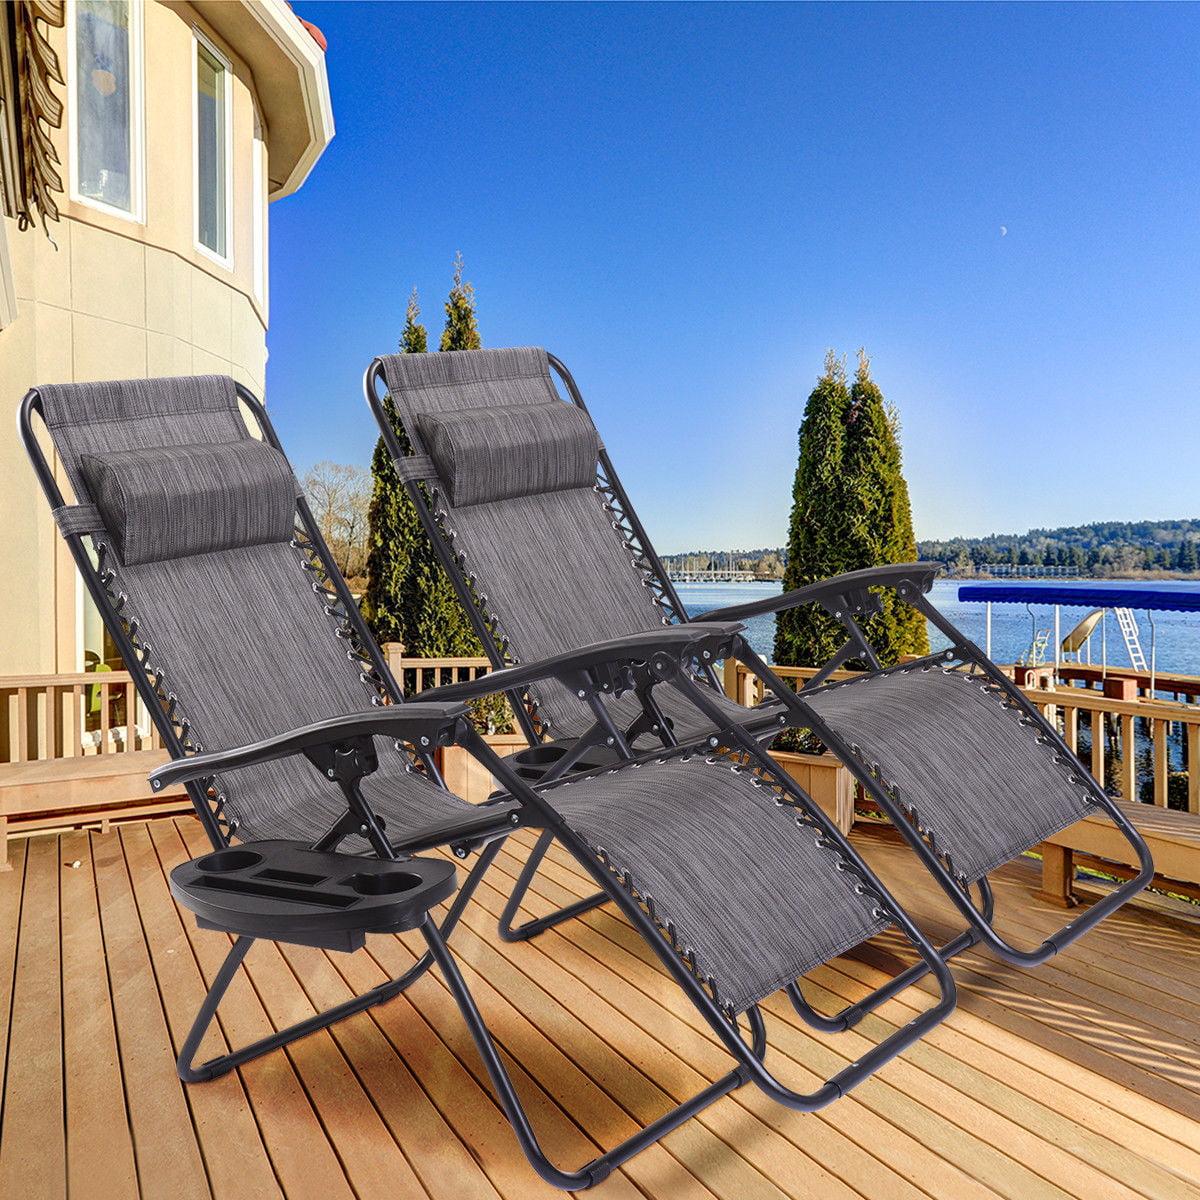 2PC Folding Zero Gravity Reclining Lounge Chairs Beach Patio W/ Utility Tray - image 2 of 8